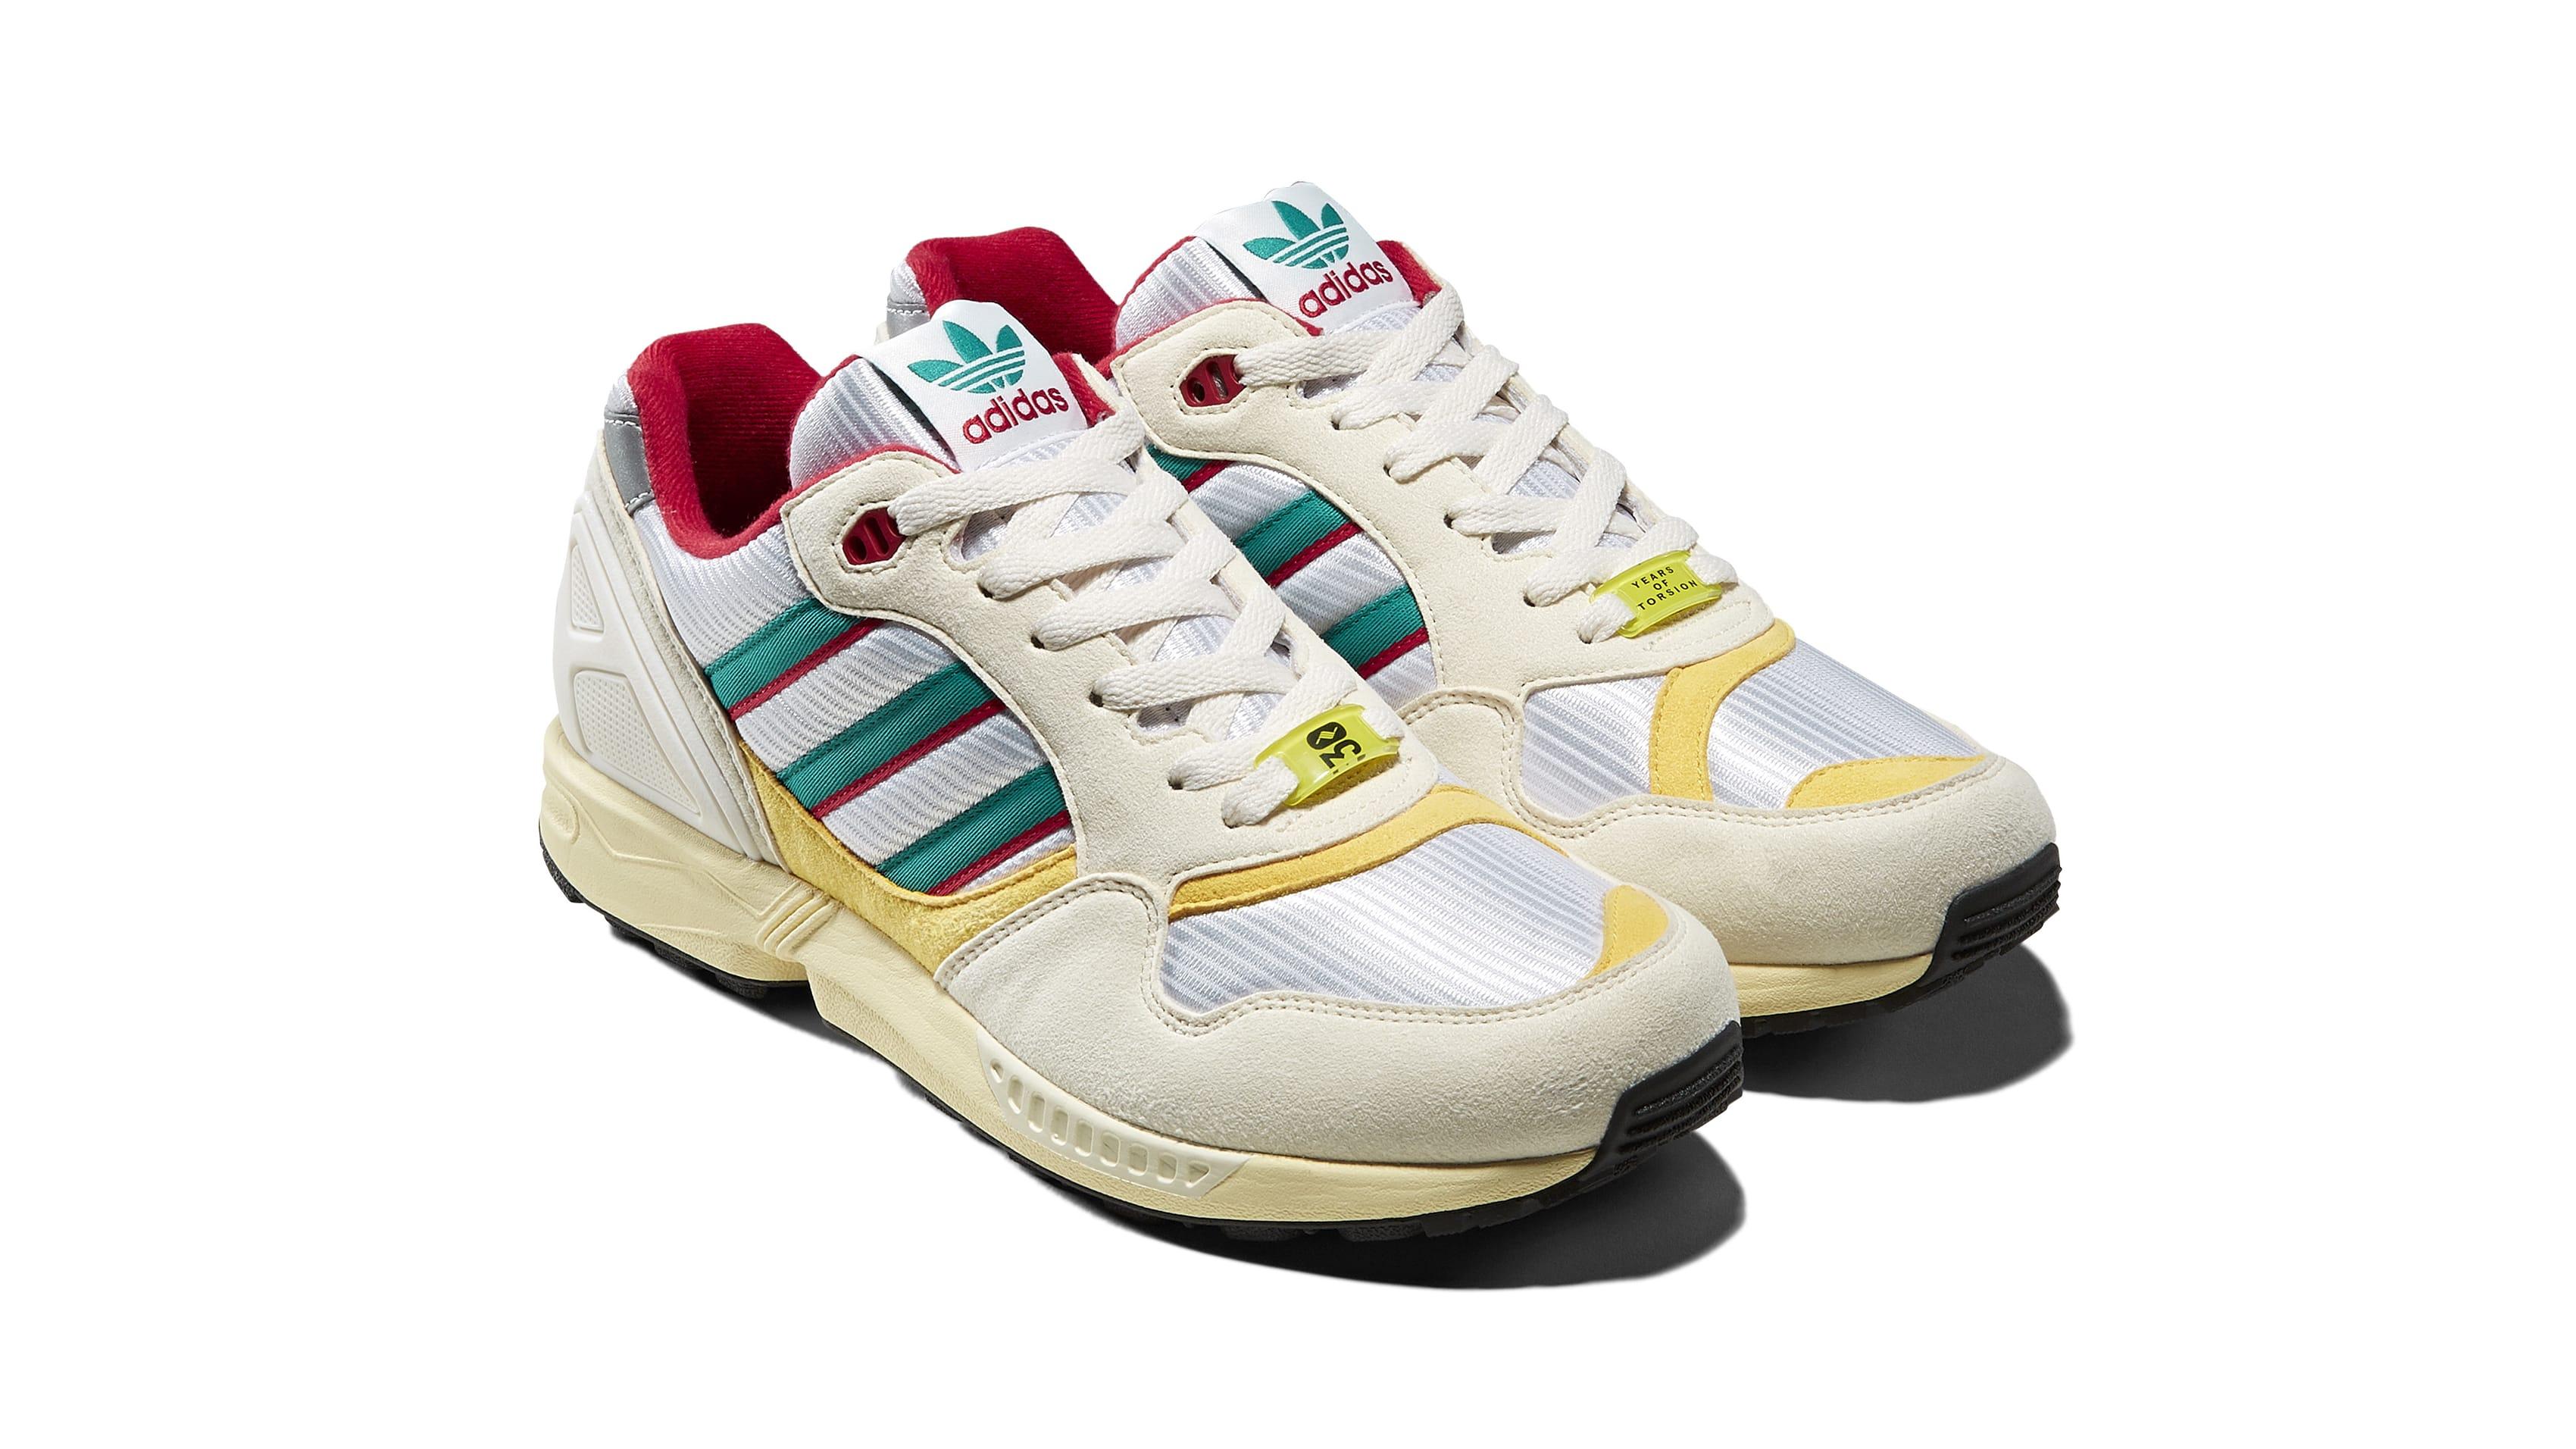 new Sneakersnstuff x ZX 500 RM F36882 Hender Scheme x